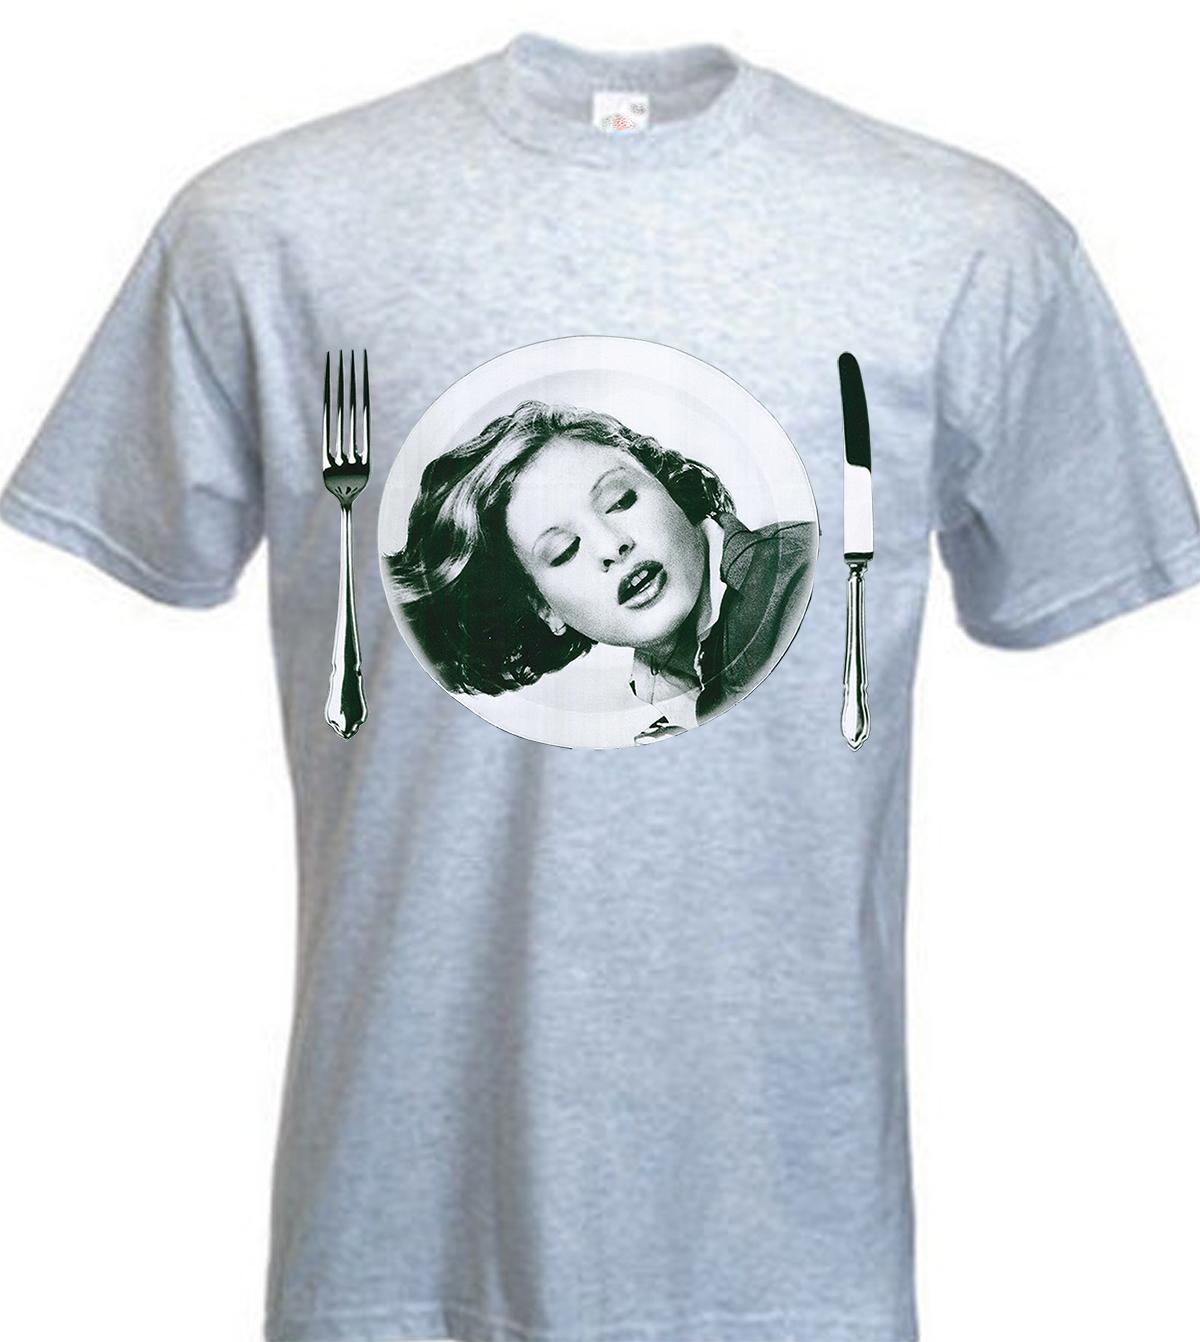 Barbara Broadcast 2013 Limited T-Shirt, Gray.